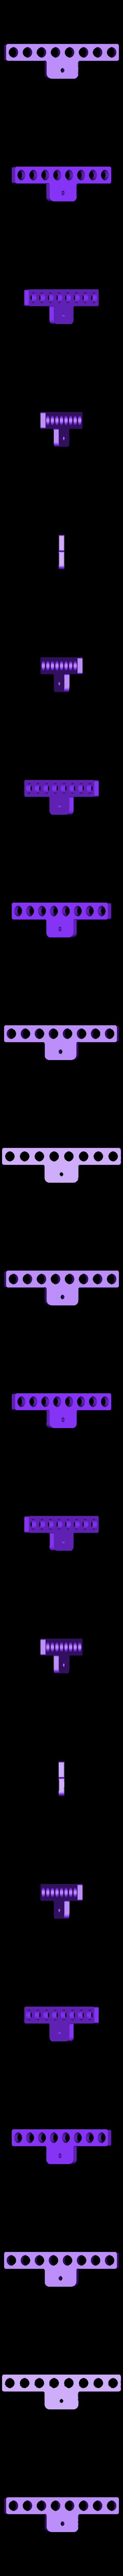 thing_1.stl Download free STL file 8 Channels vacuum aspirator • 3D printing model, cyrus